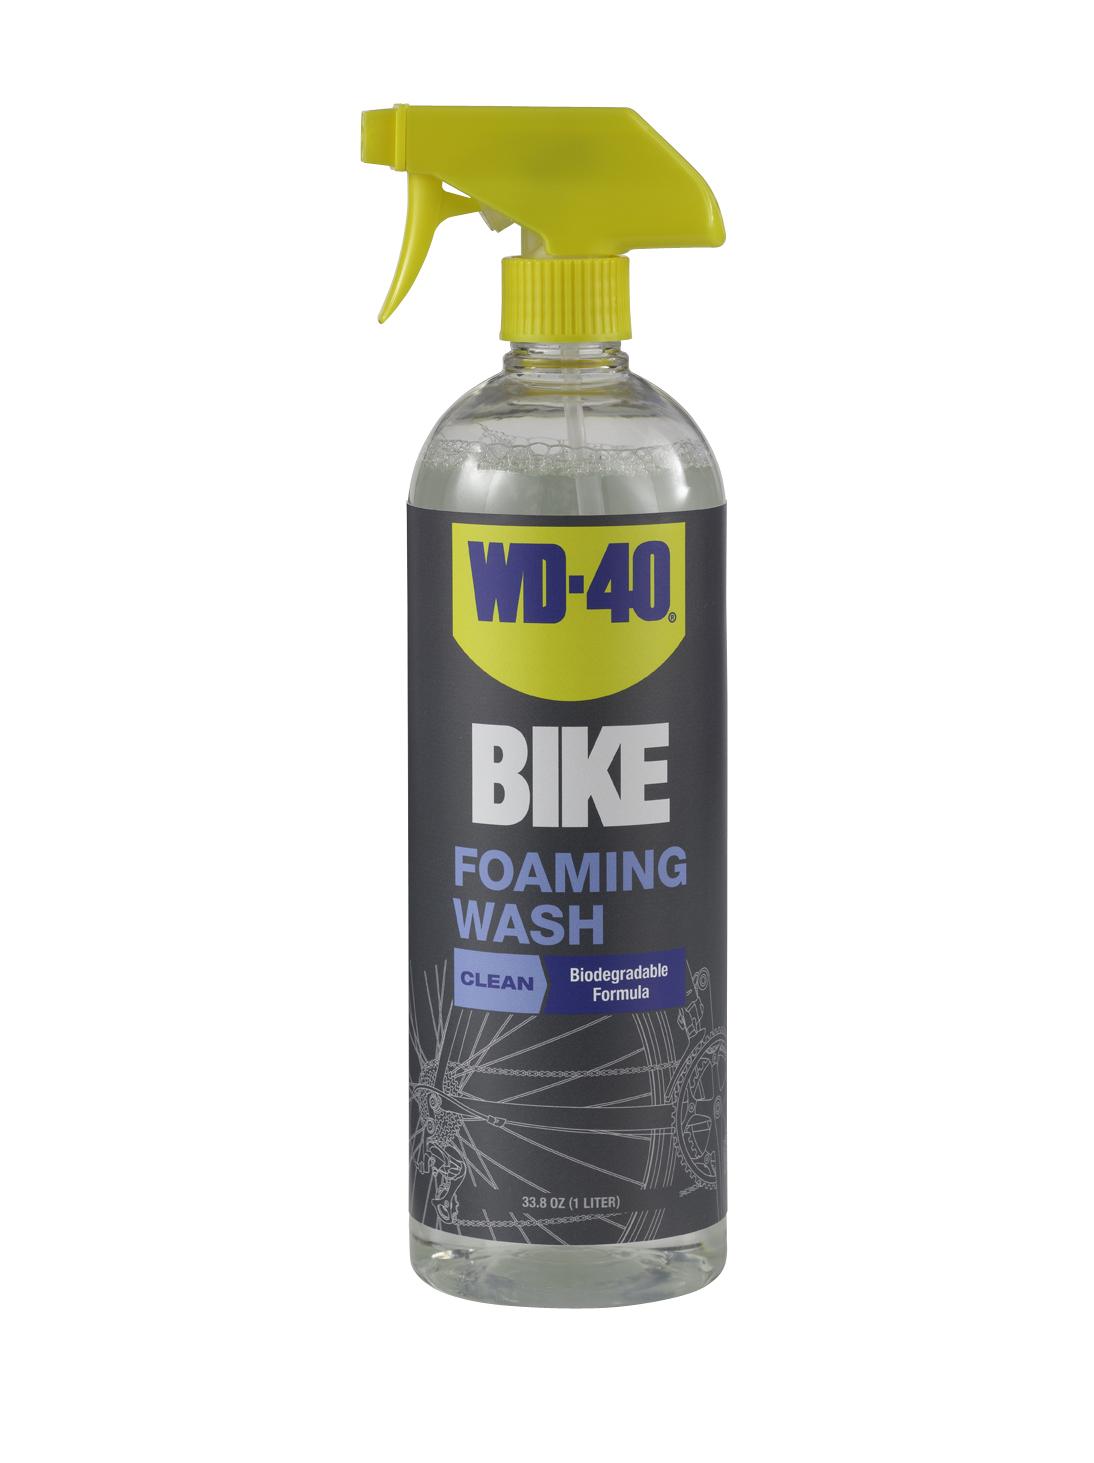 WD-40 BIKE Foaming wash